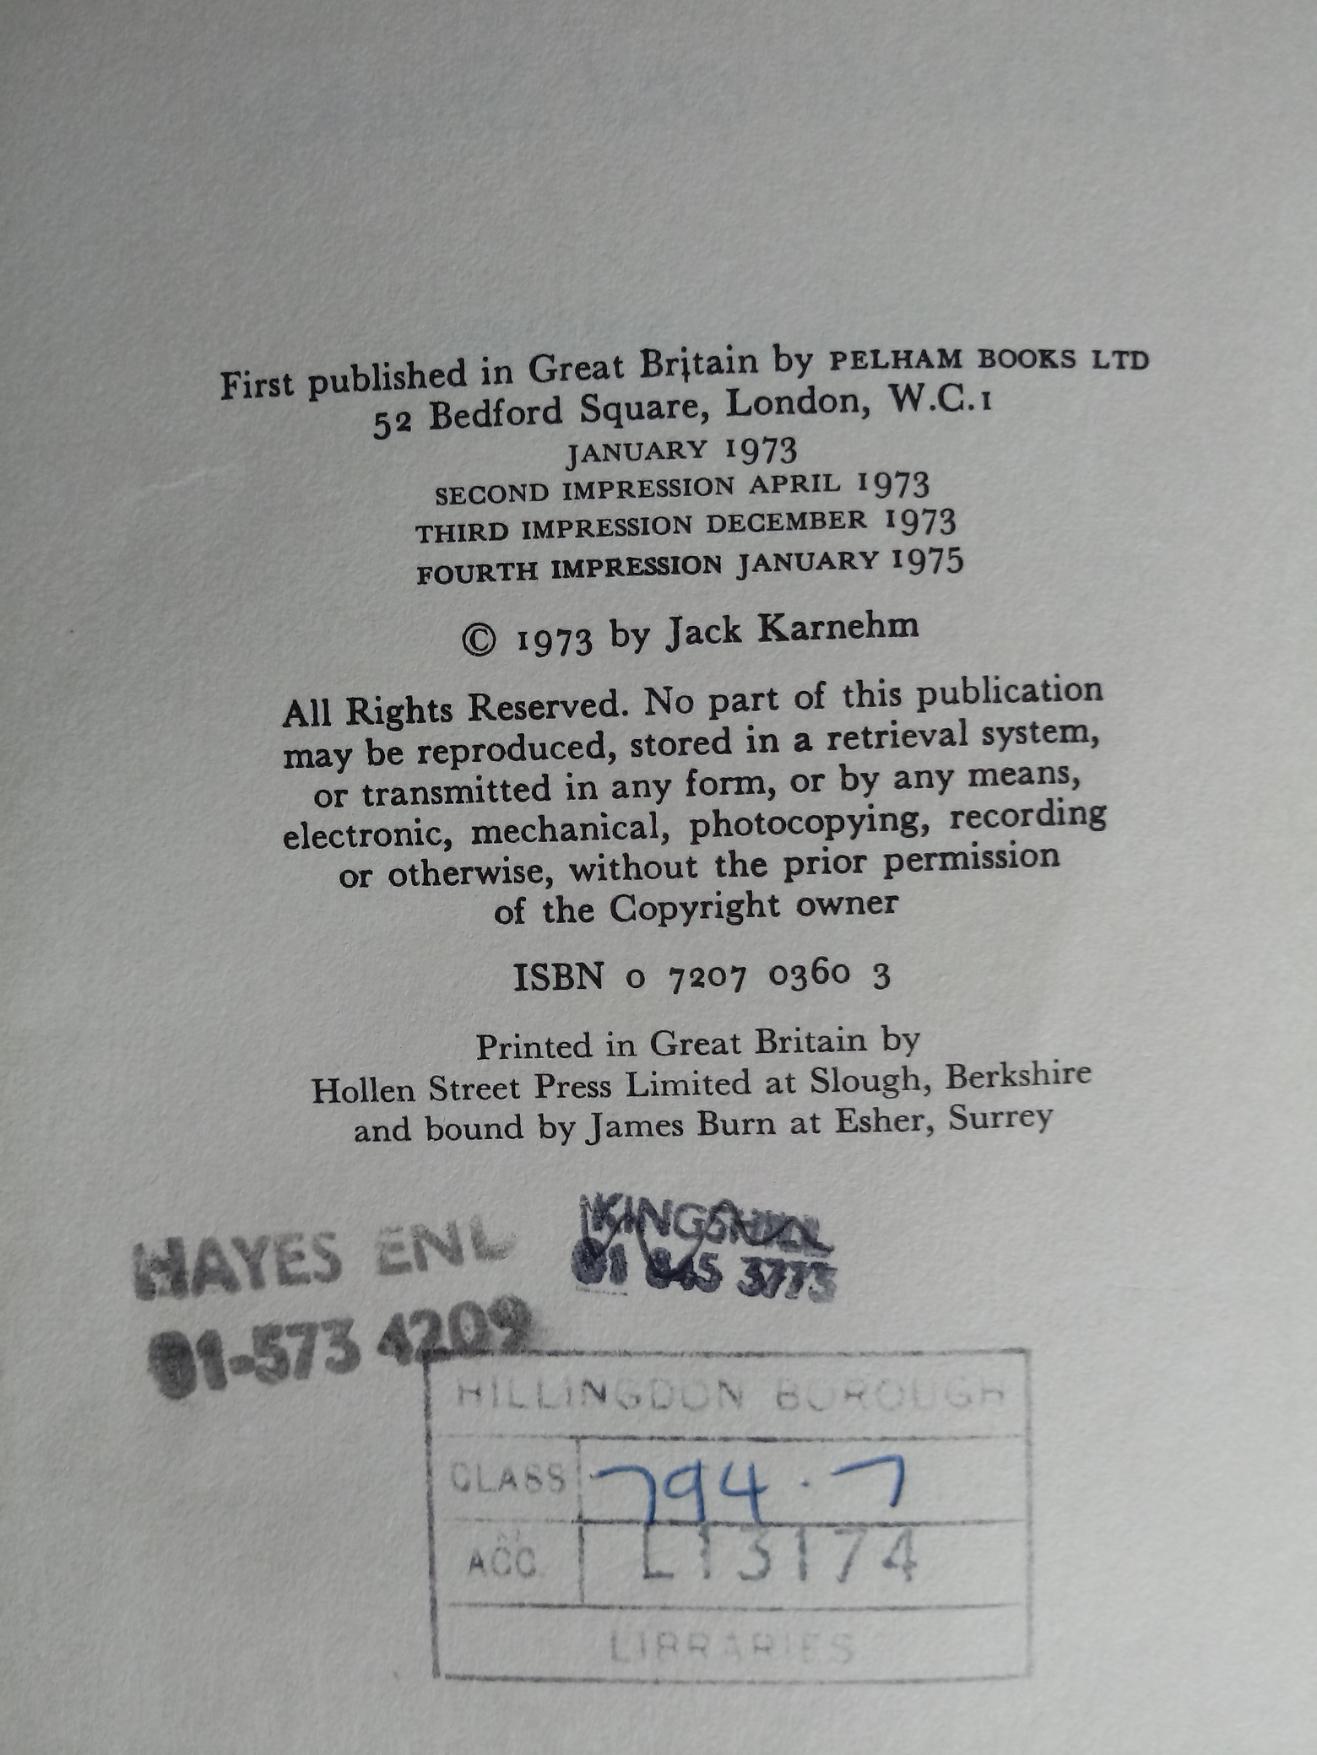 Billiards & Snooker hardback book by Jack Karnehm. Published 1973 by Pelham Books. Dust jacket - Image 3 of 3